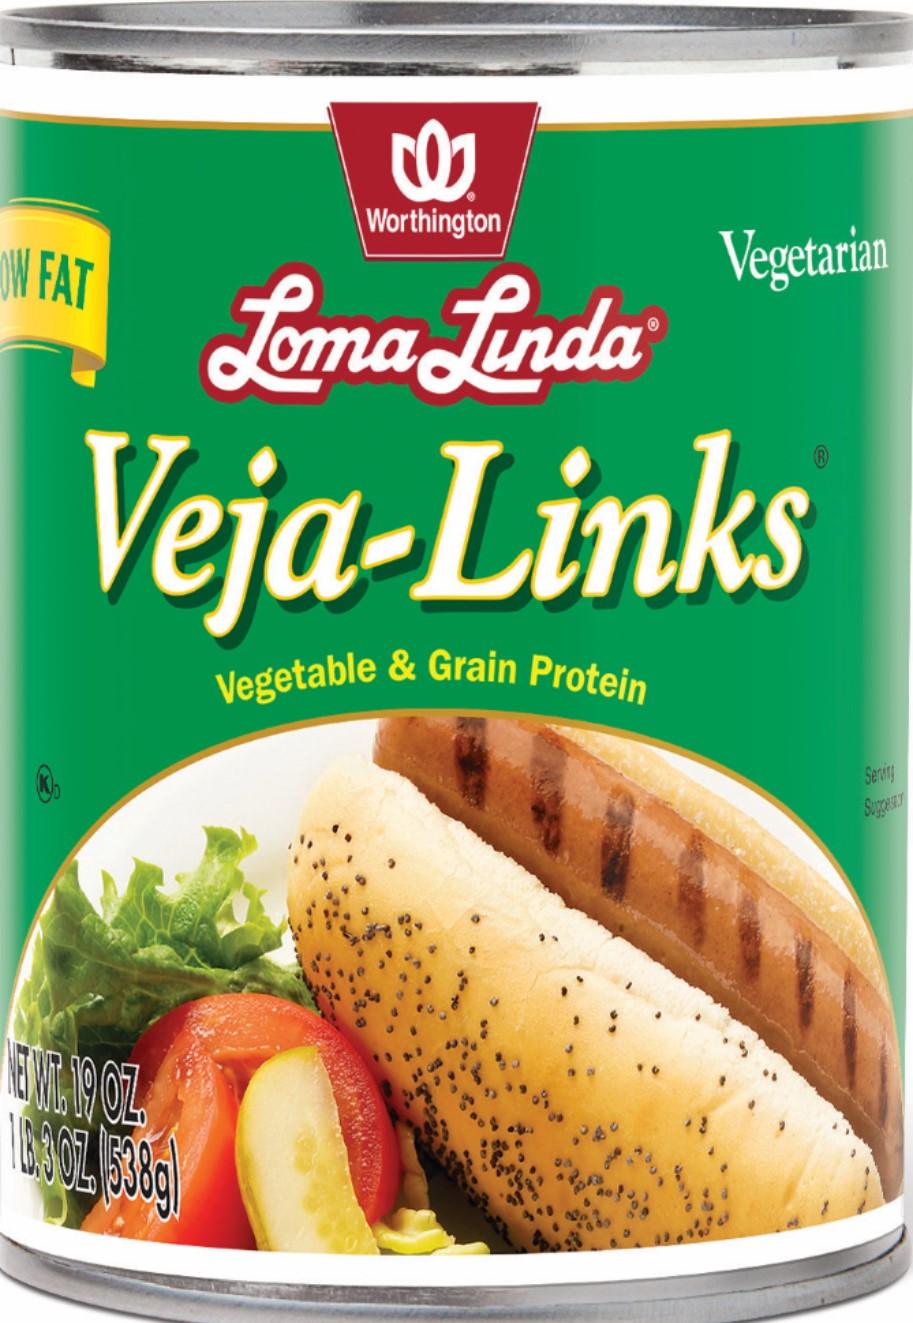 VEJA LINKS LOW FAT,WORTHINGTON LF,4556100074